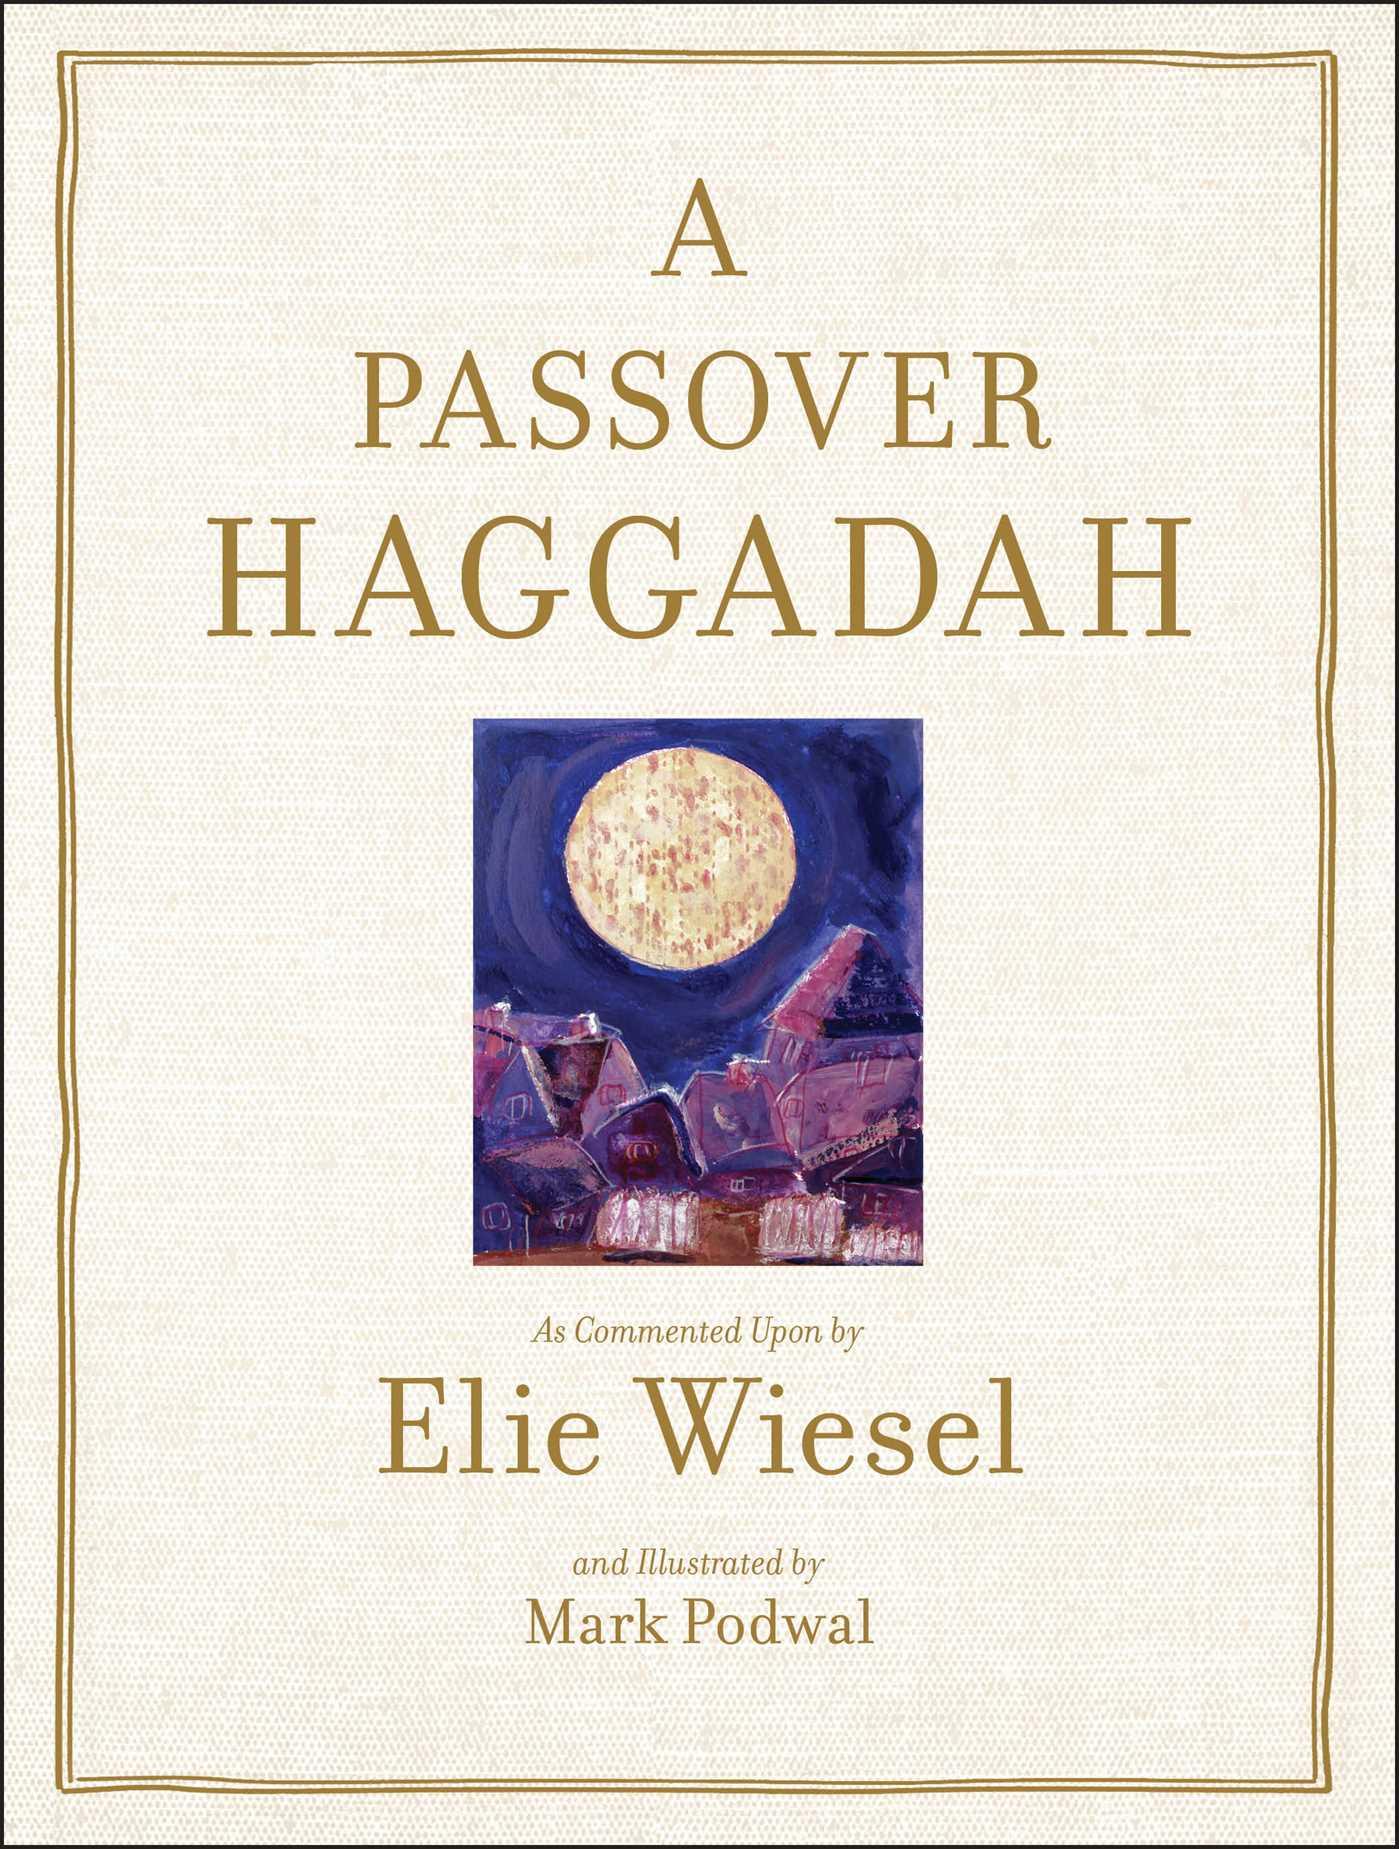 Passover haggadah 9781439142257 hr